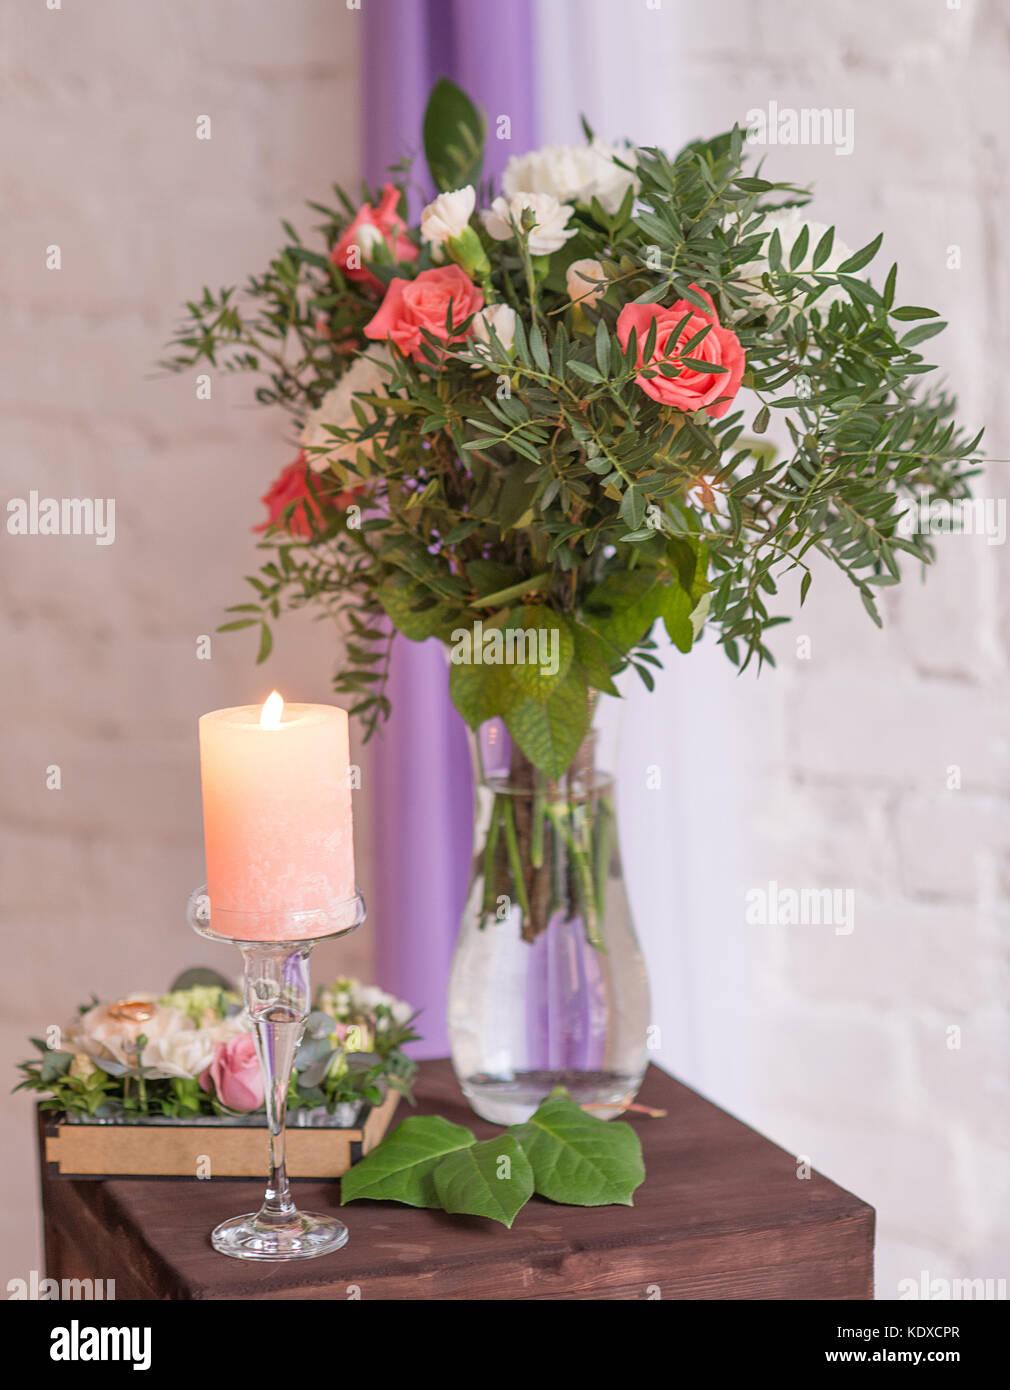 Colorful Flower Bouquet Arrangement Centerpiece In Vase On Wooden